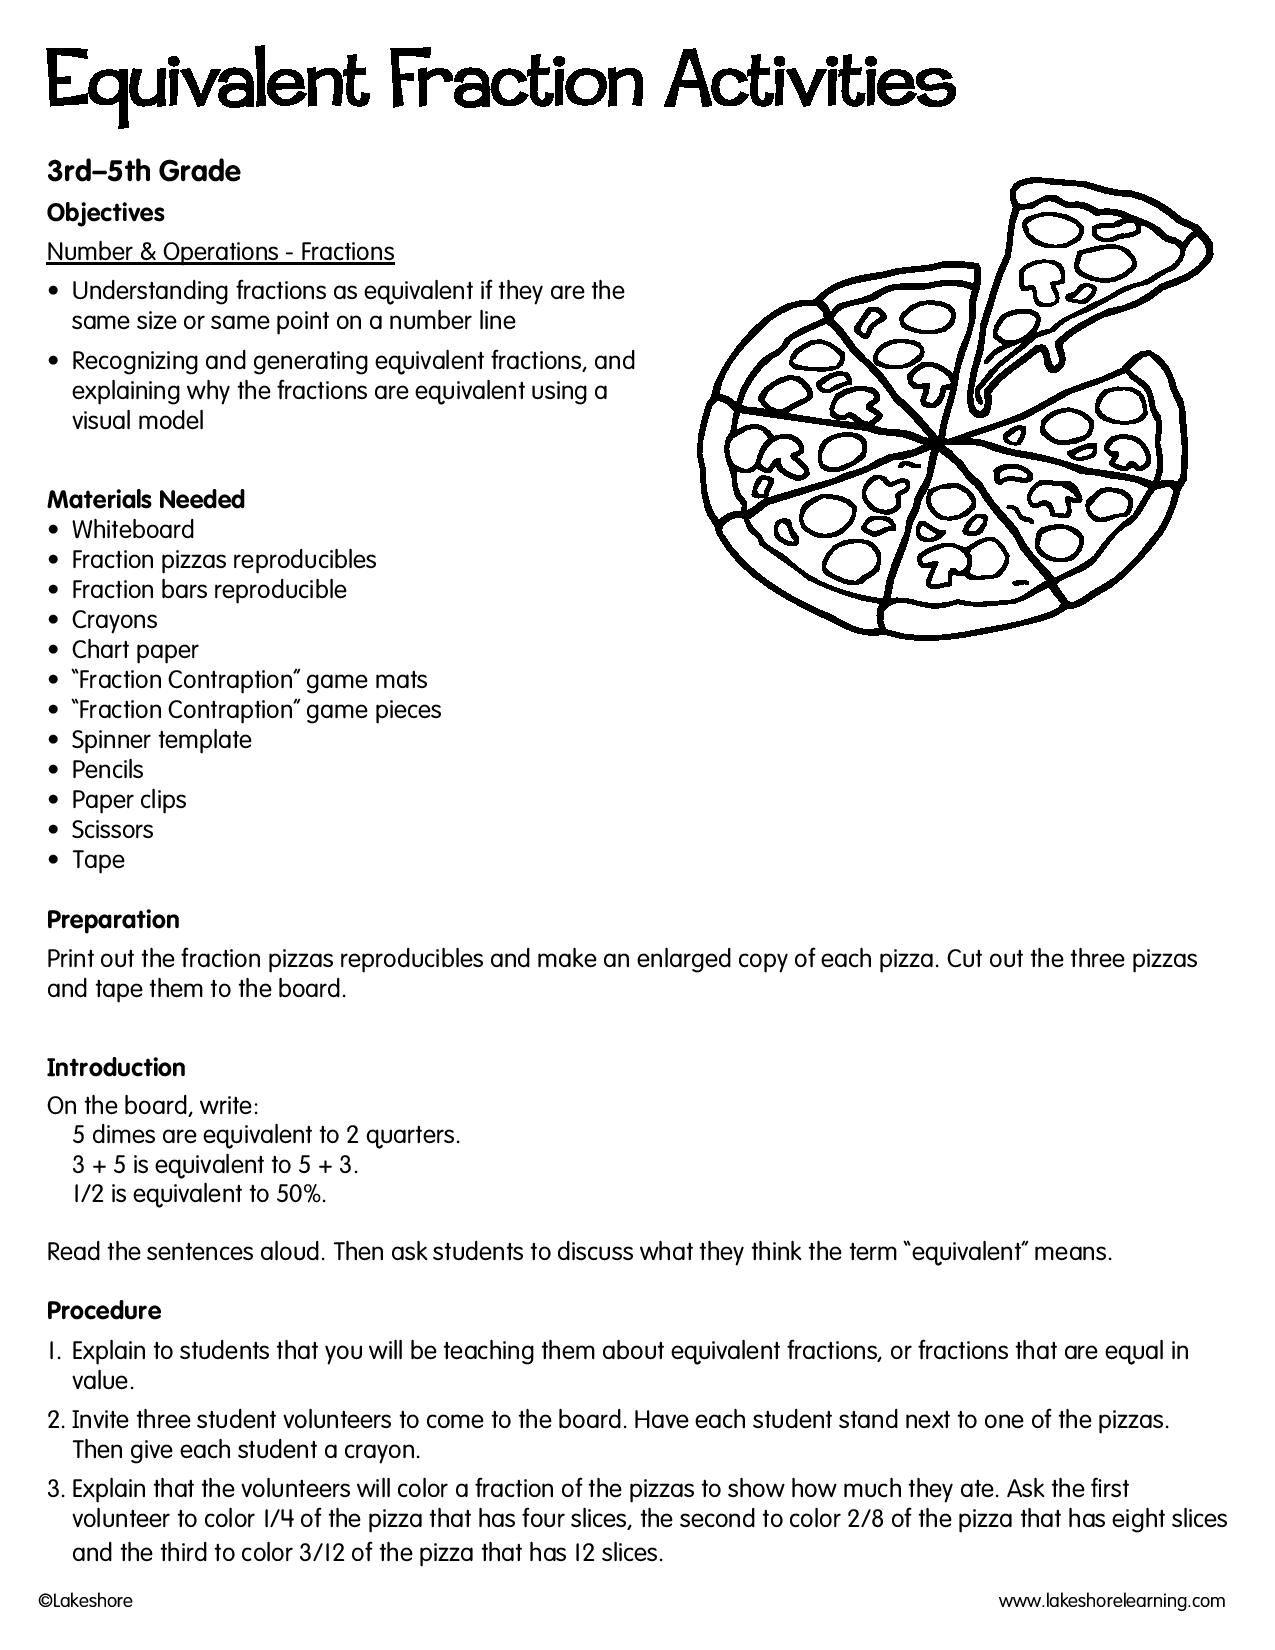 Equivalent Fractions Worksheets Grade 3 [ 1650 x 1275 Pixel ]